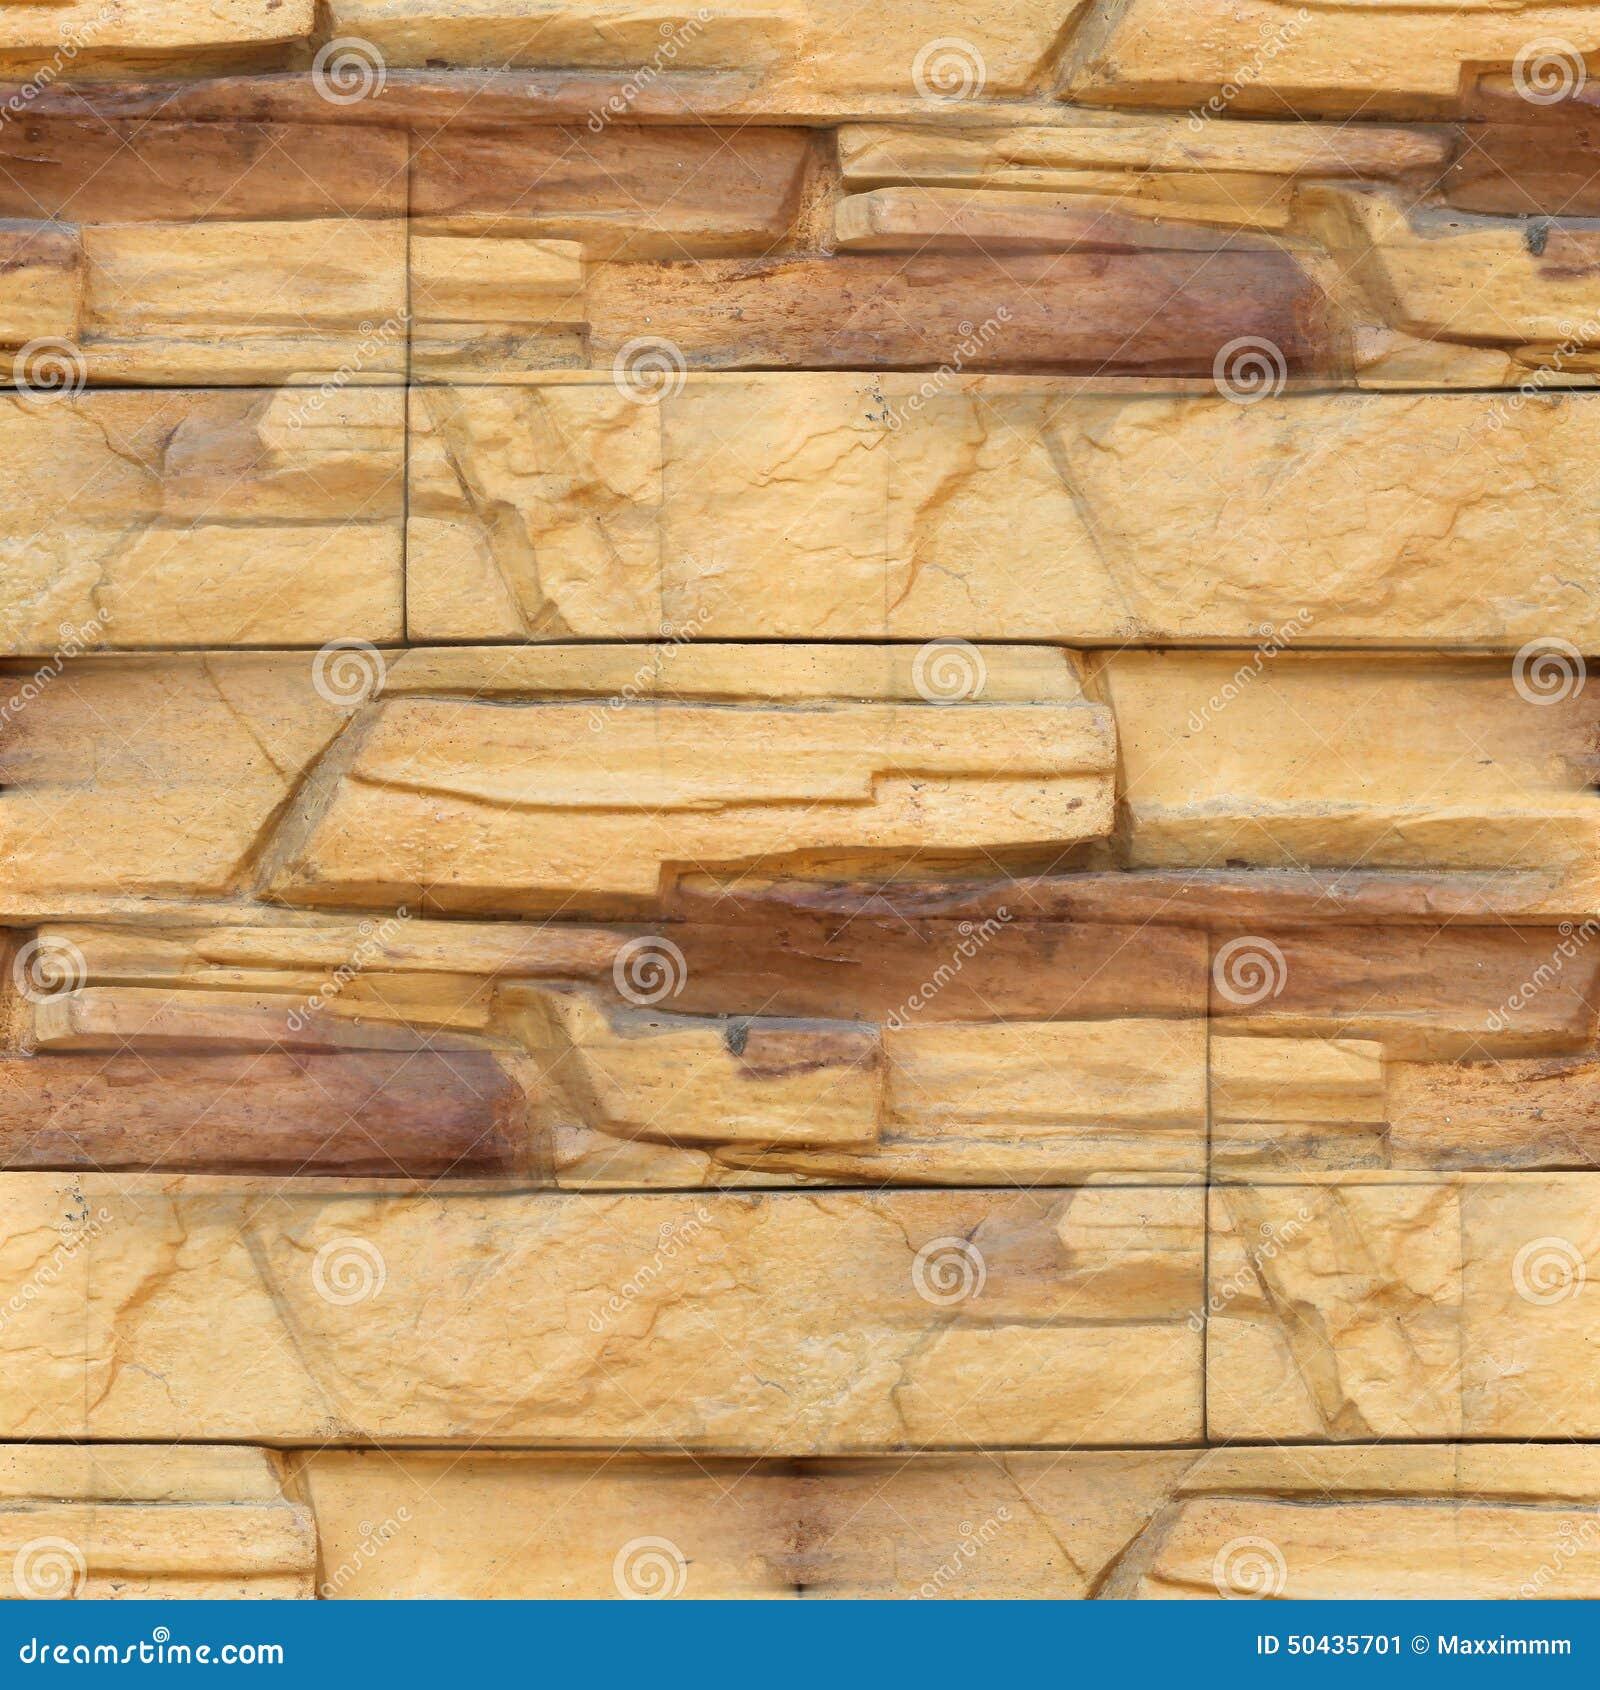 Granite Wallpaper Decorative Brick Wall Seamless Stock Image - Image ...